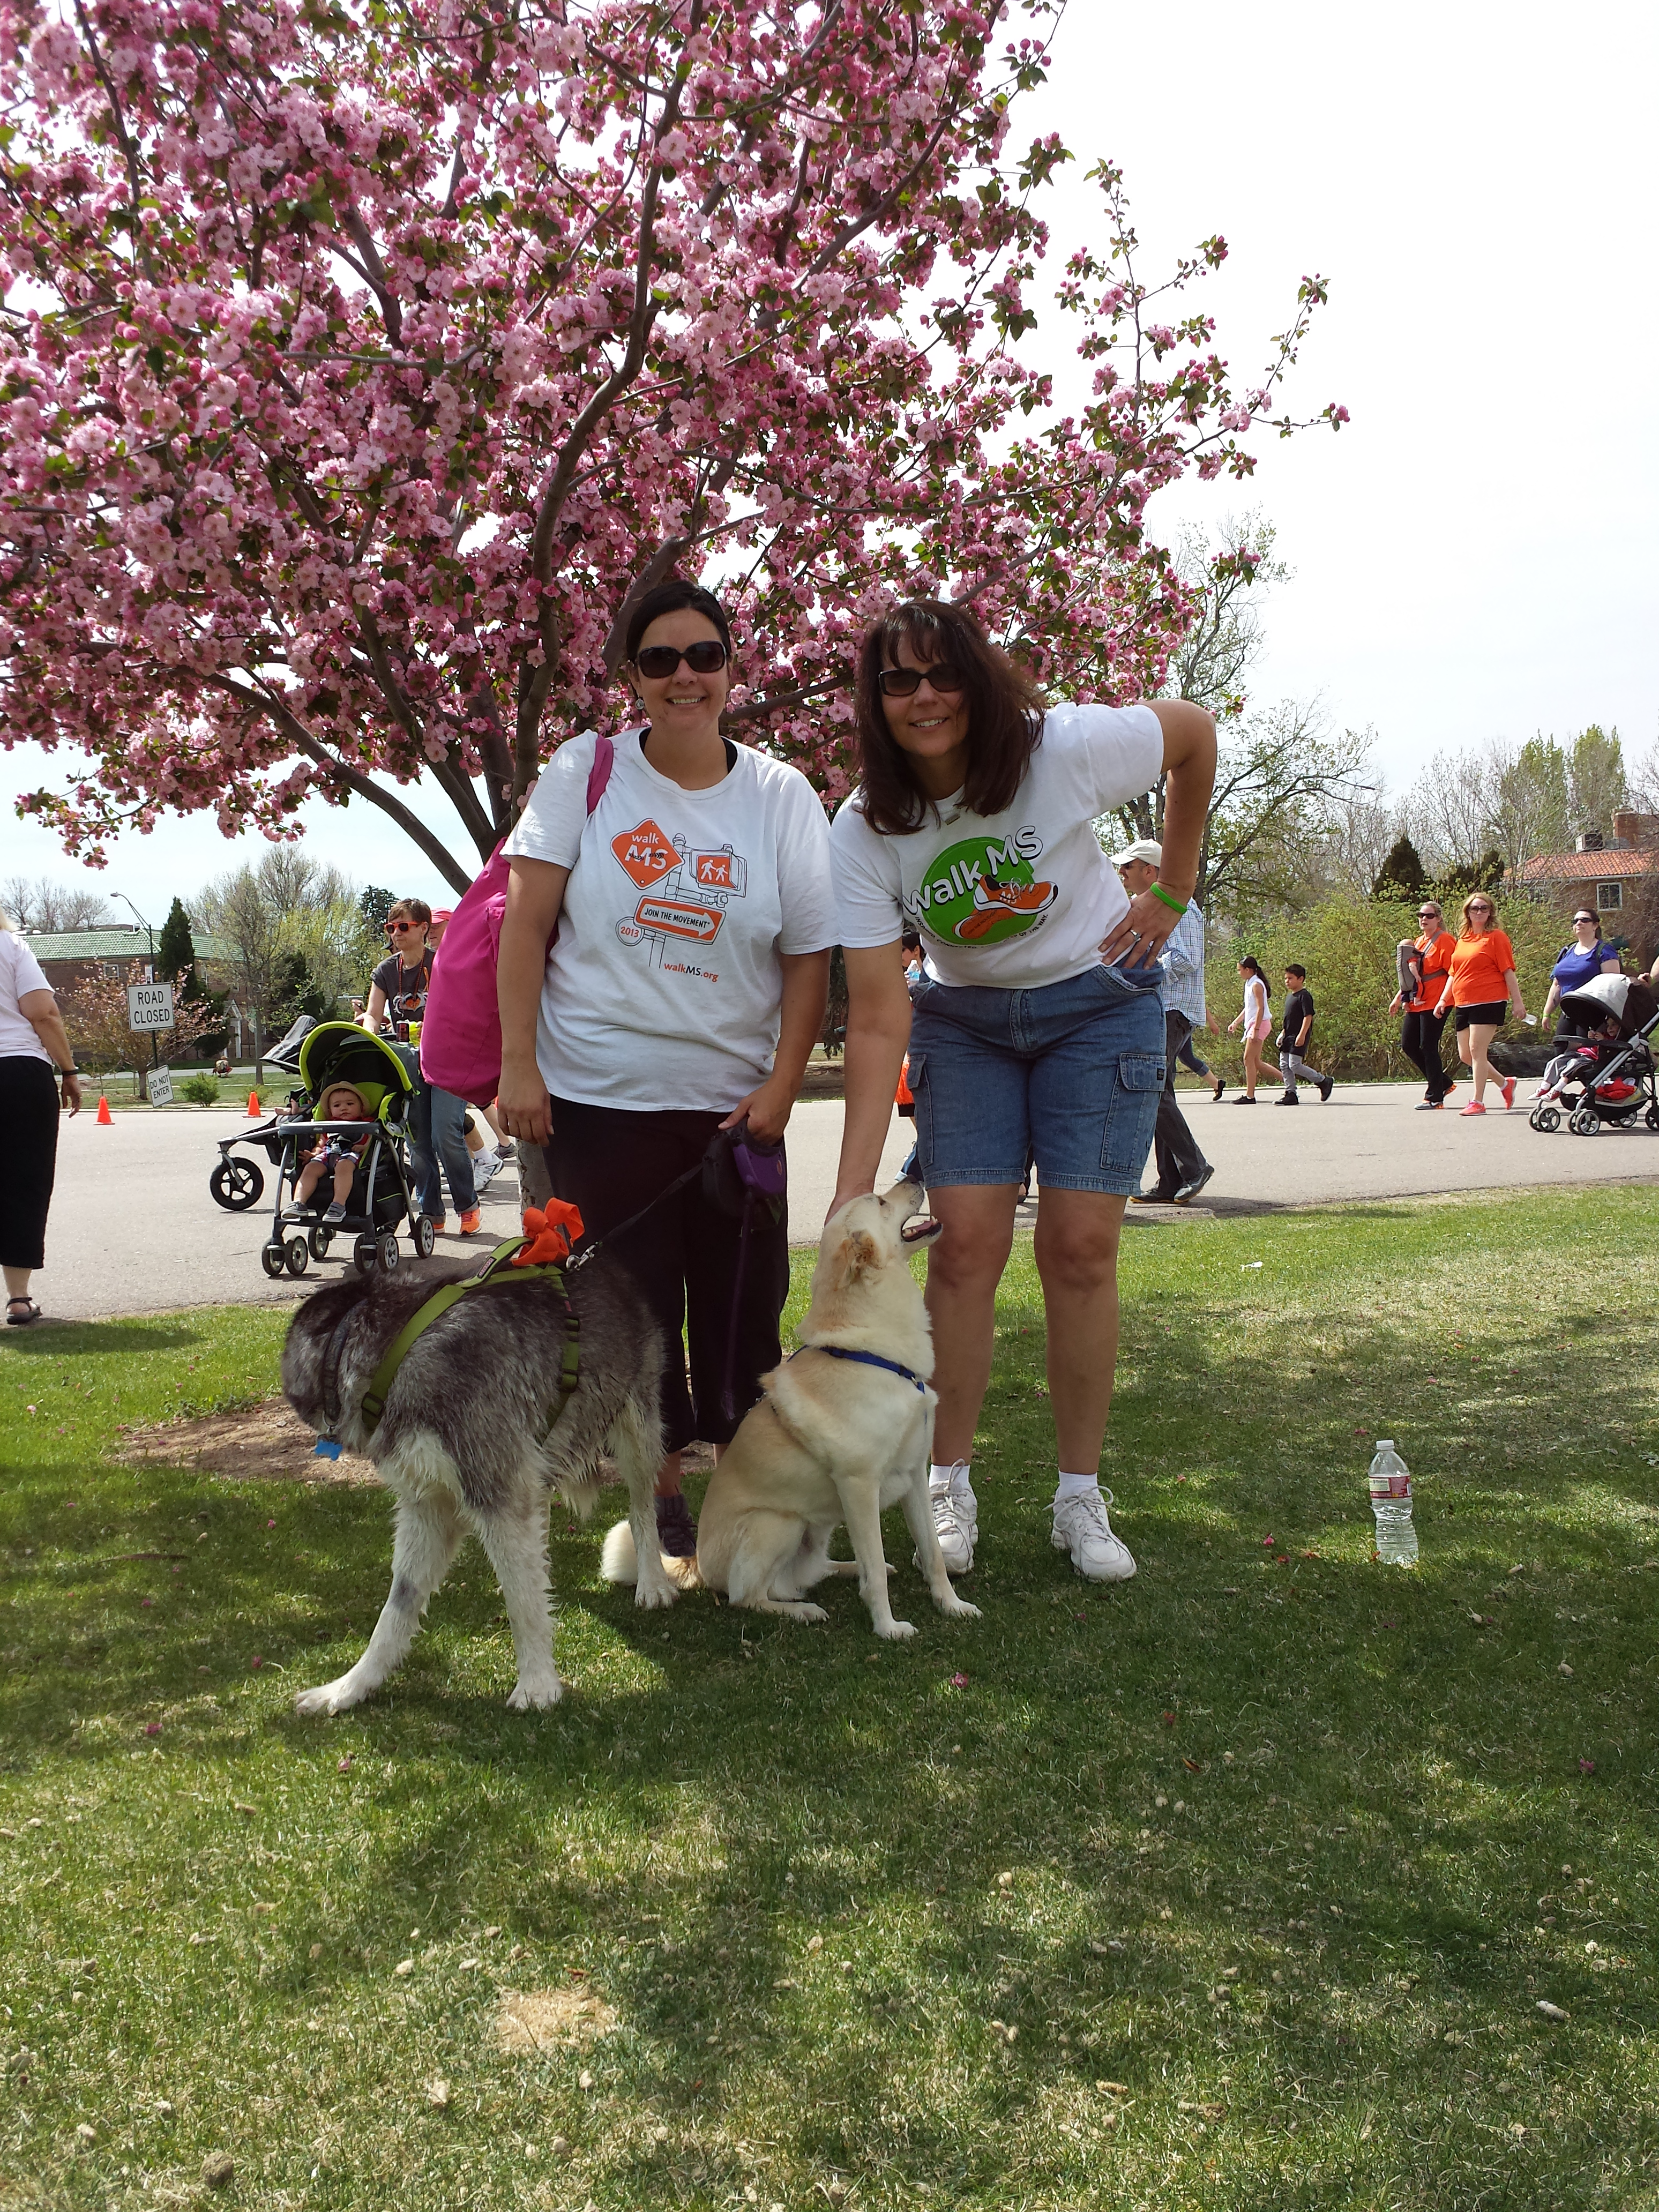 MS Walk 2014 - Denver